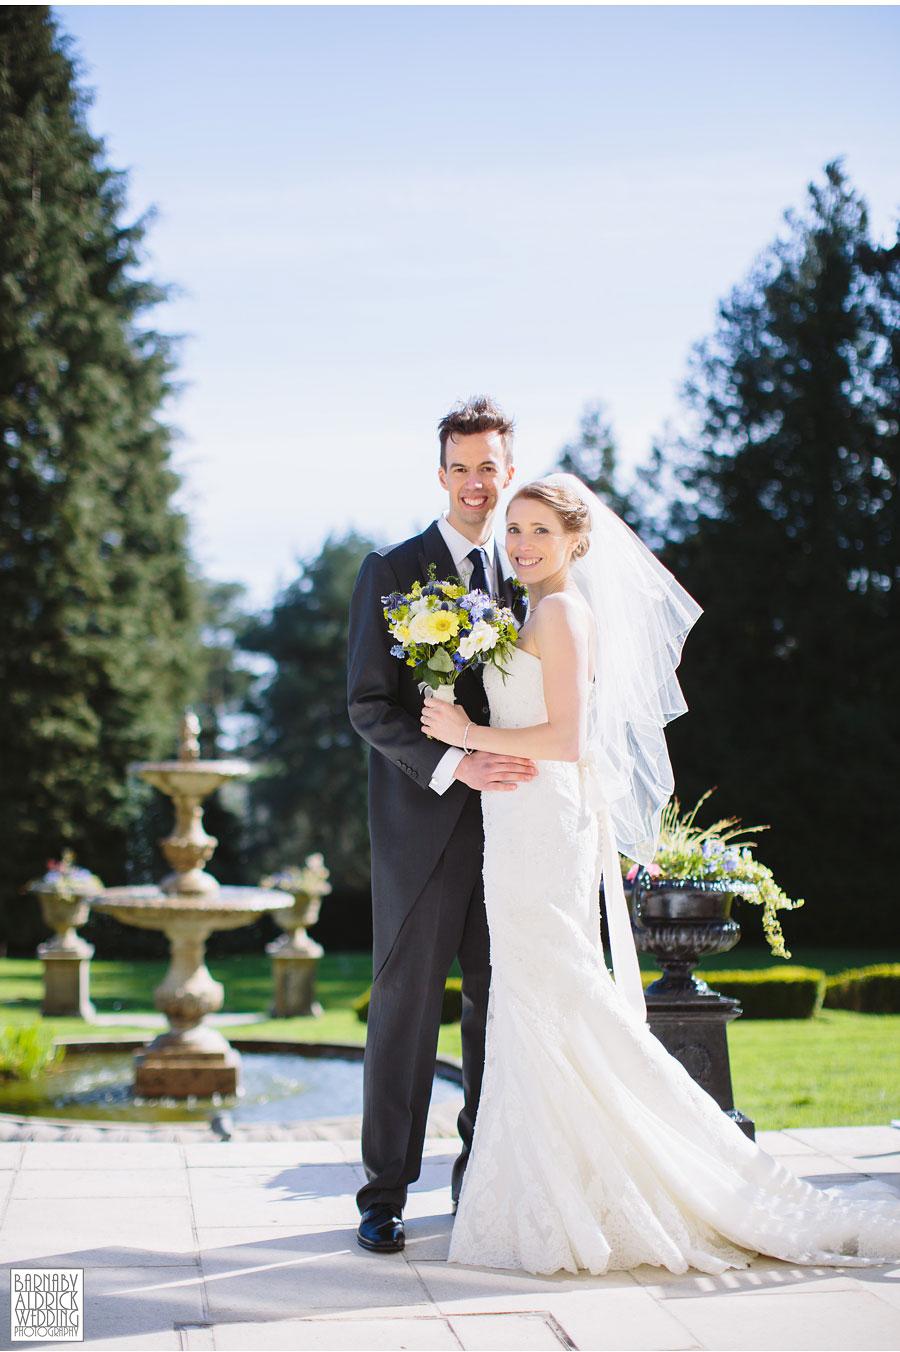 Wedding Photography at Buckland Tout Saints South Devon, Devon Wedding Photographer Barnaby Aldrick, Dartmouth Wedding; Kingswear Devon Wedding, 078